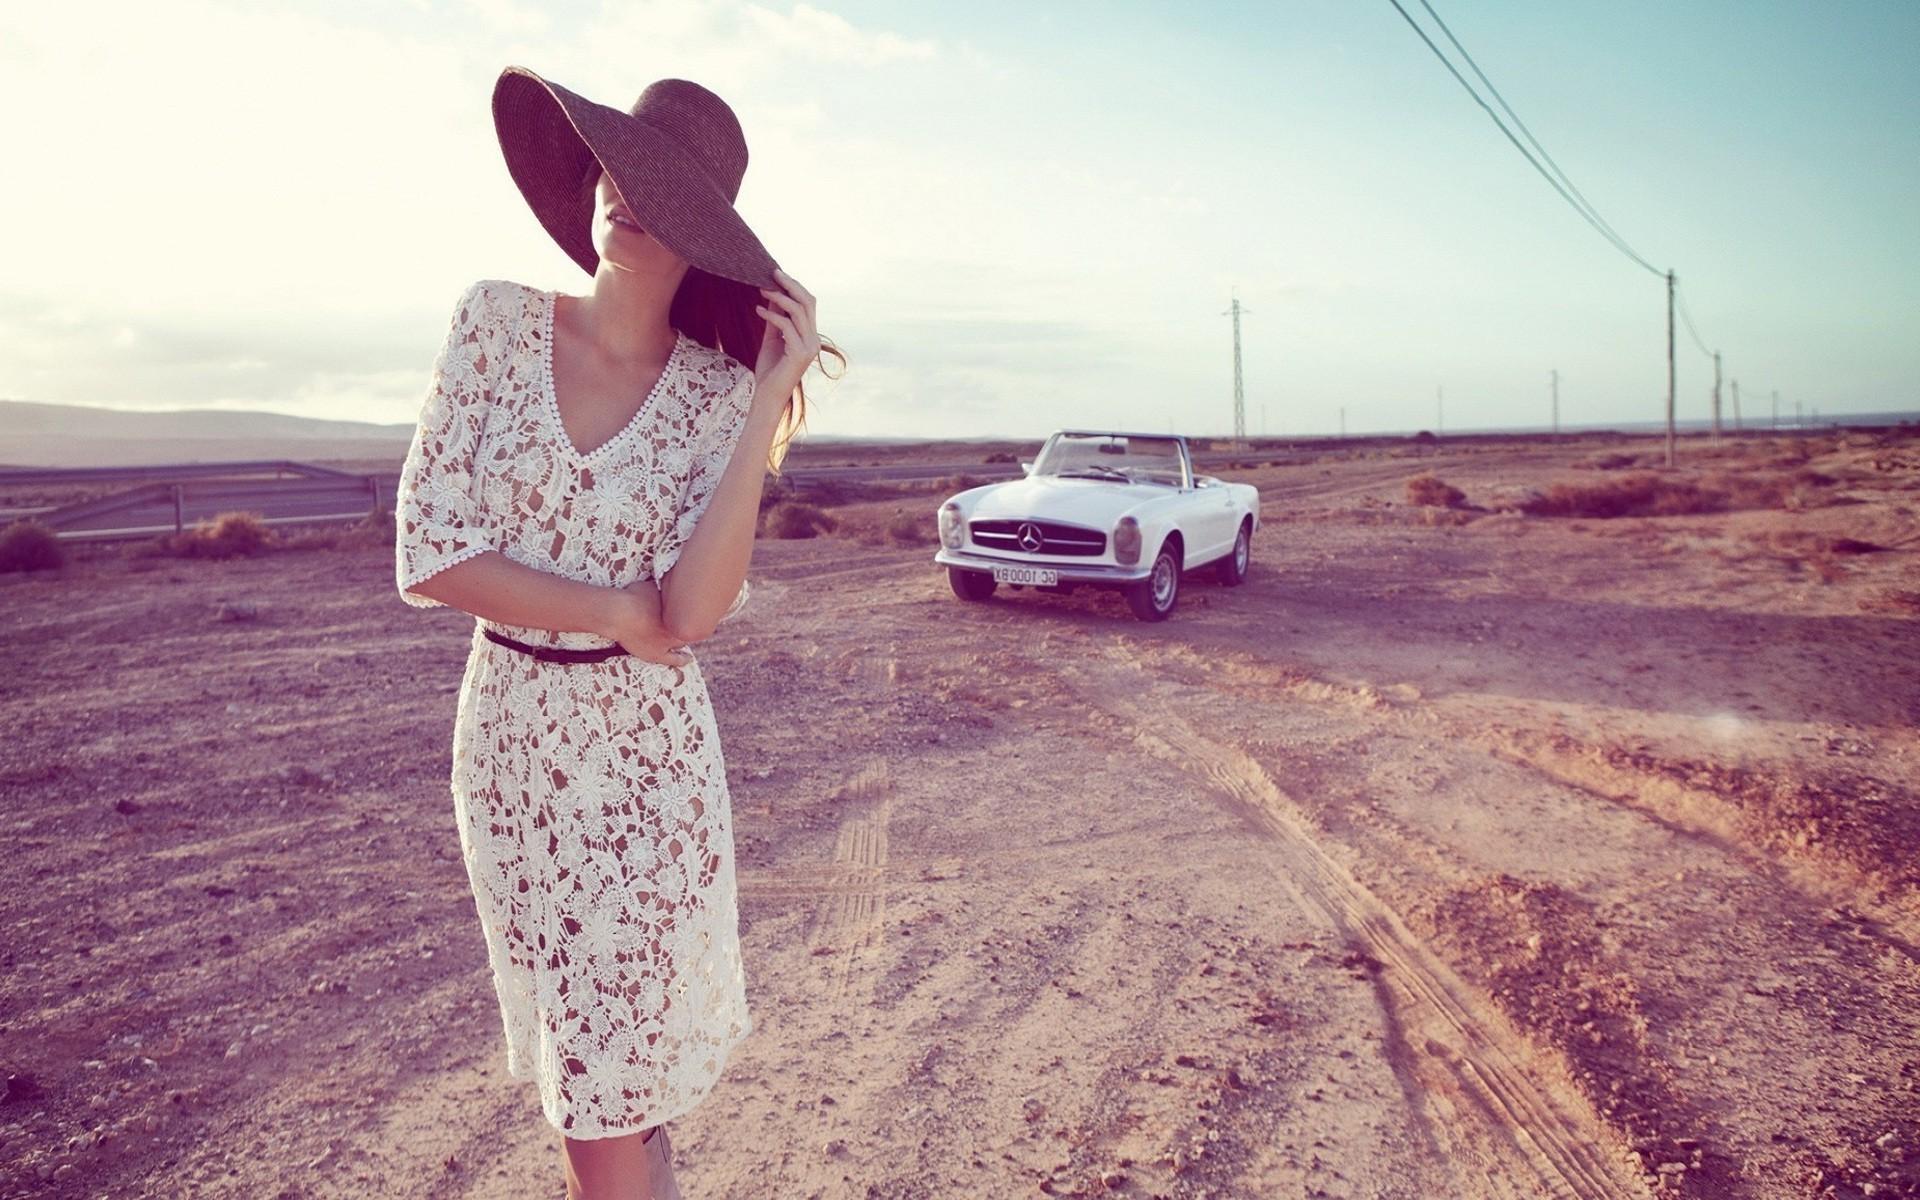 Landscape Women Model Car Photography Dress See Through Clothing Mercedes Benz Fashion Pink Spring Vintage